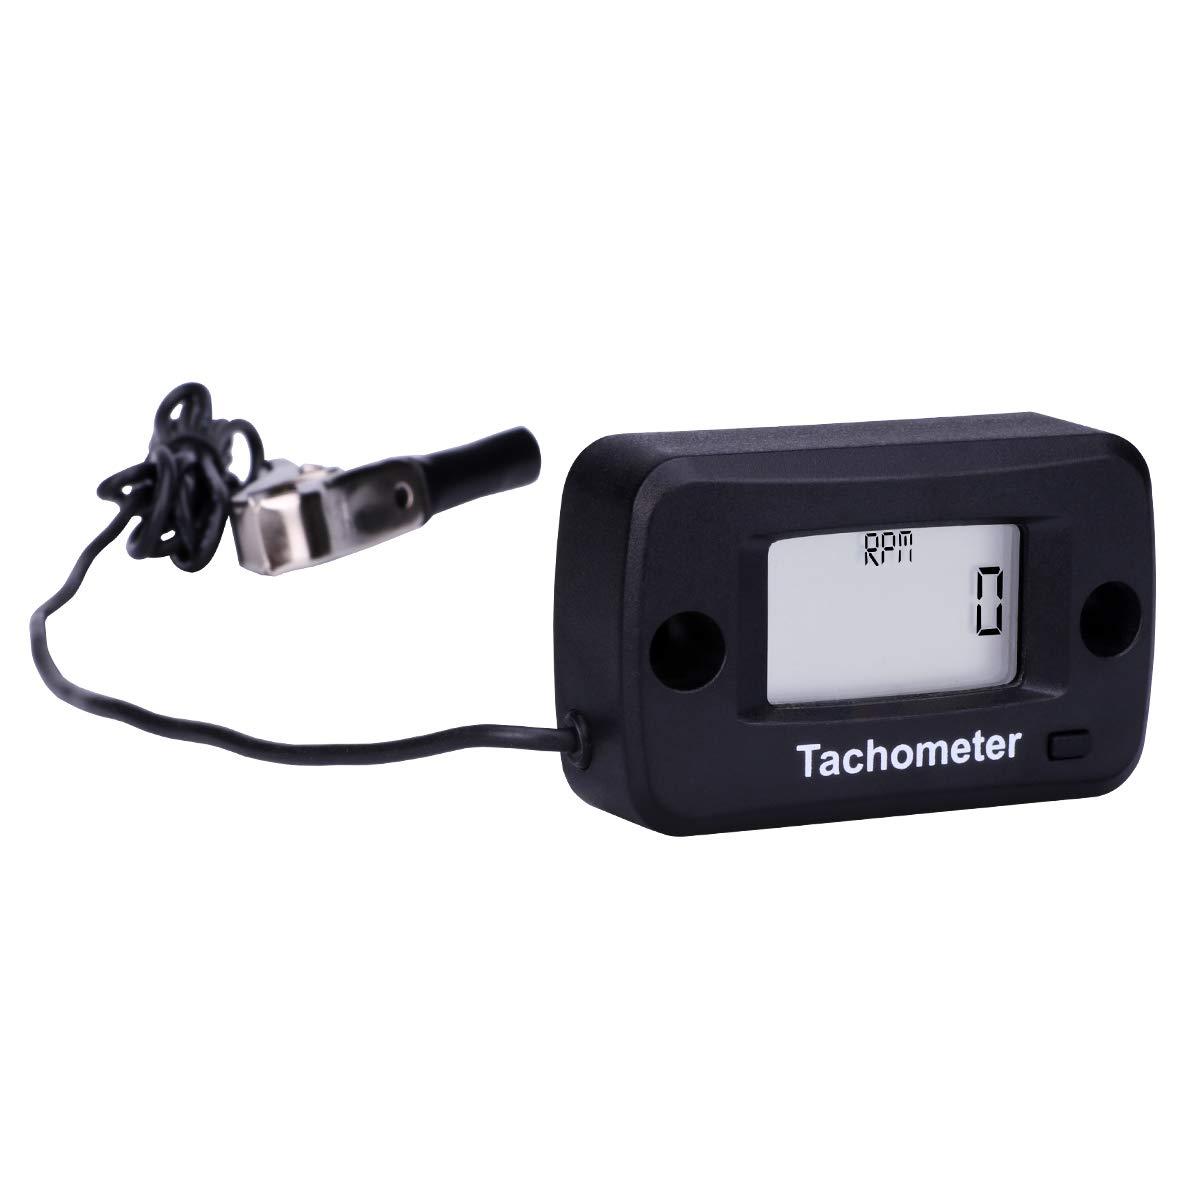 Amazon.com: AIMILAR - Tacómetro digital para cadena de motor ...